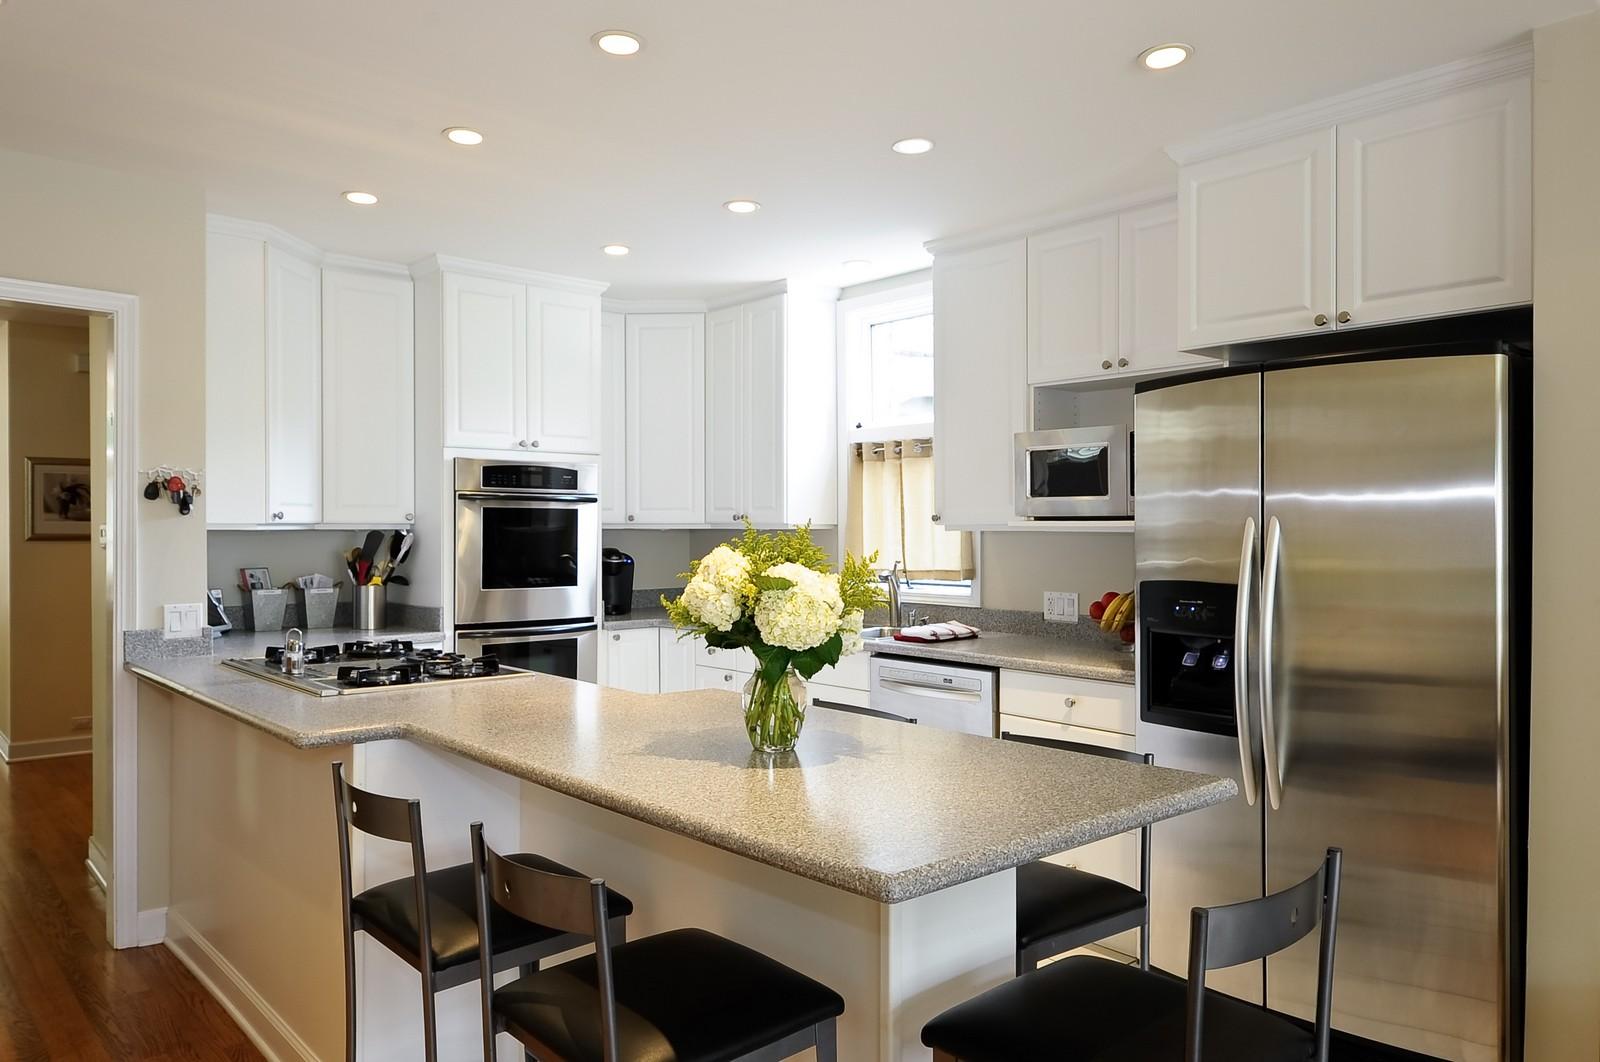 Real Estate Photography - 1144 W. Altgeld, Chicago, IL, 60614 - Kitchen